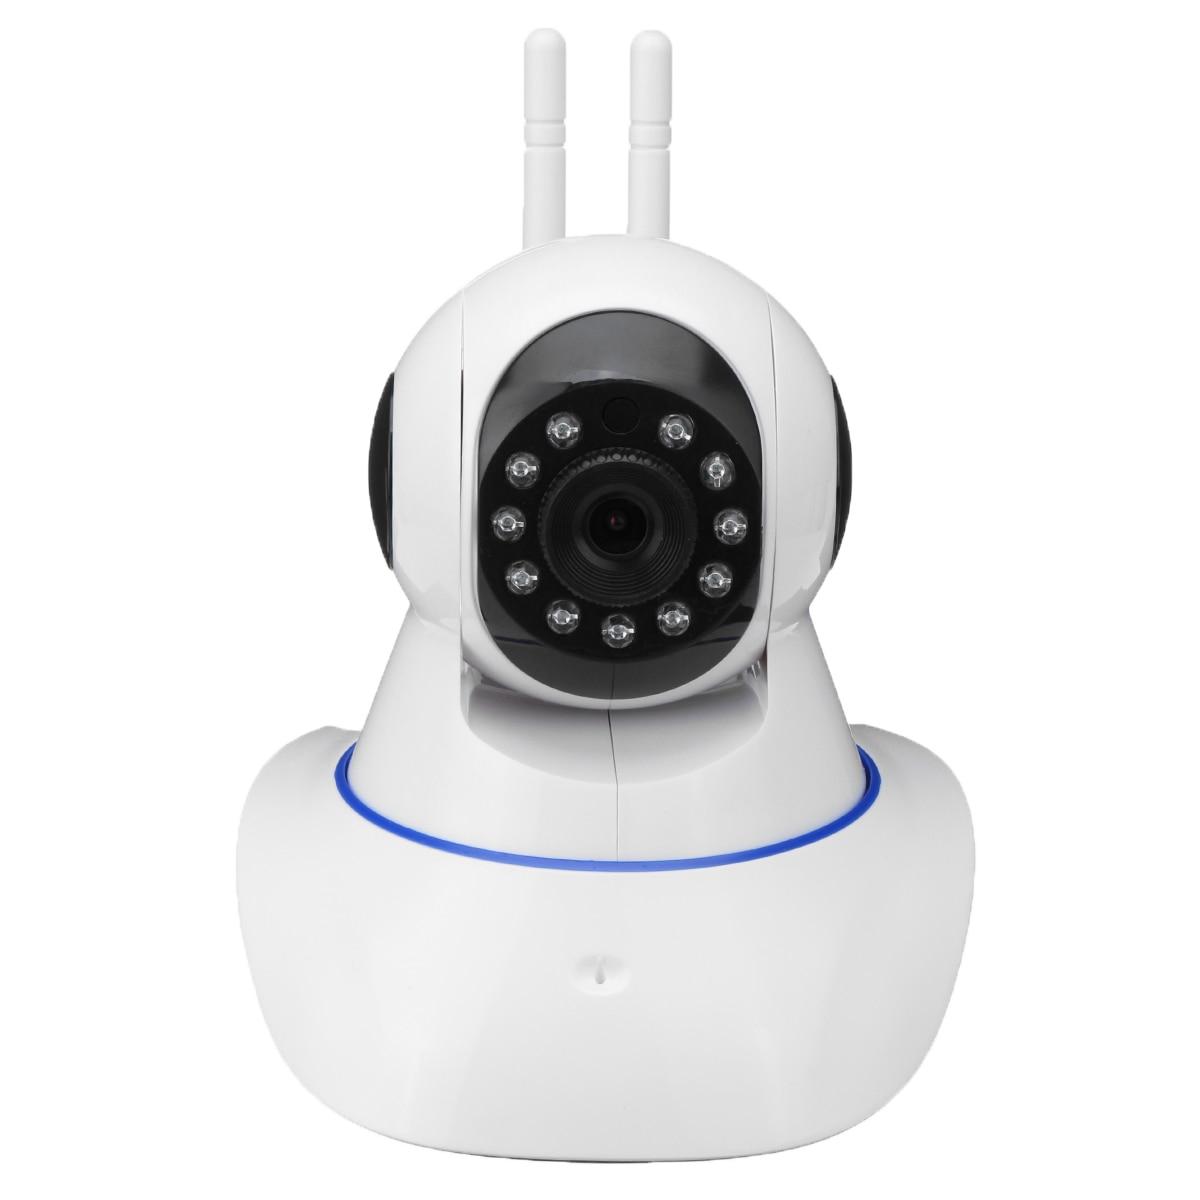 NEW Safurance 720P HD Wireless WiFi IP Home Security Network Camera Baby Monitor CCTV IR Night Vision Safety Surveillance safurance 720p hd wireless wifi ip camera home security cctv system baby monitor safety surveillance